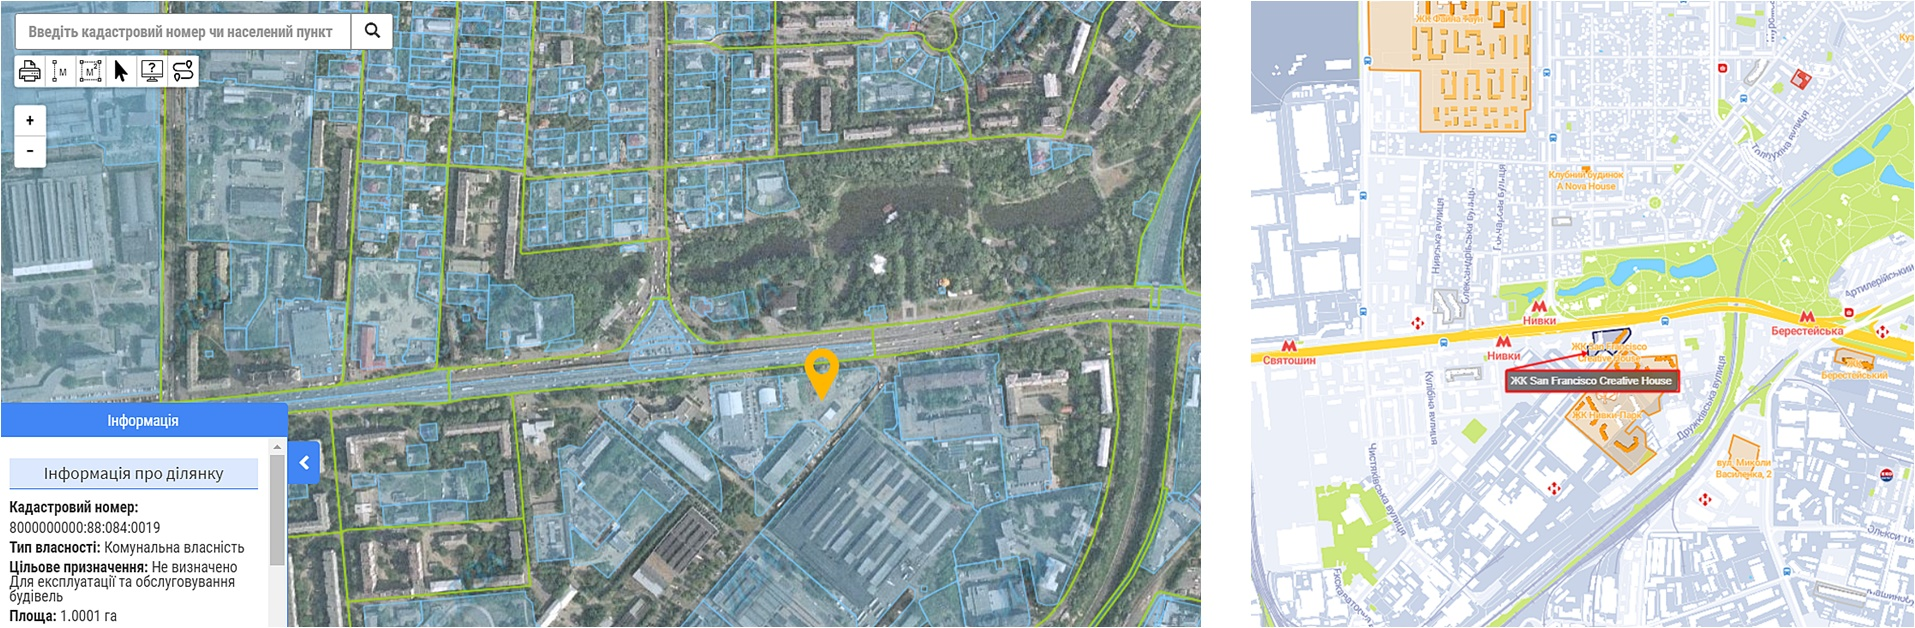 ЖК San Francisco Creative House данные кадастра и на карте